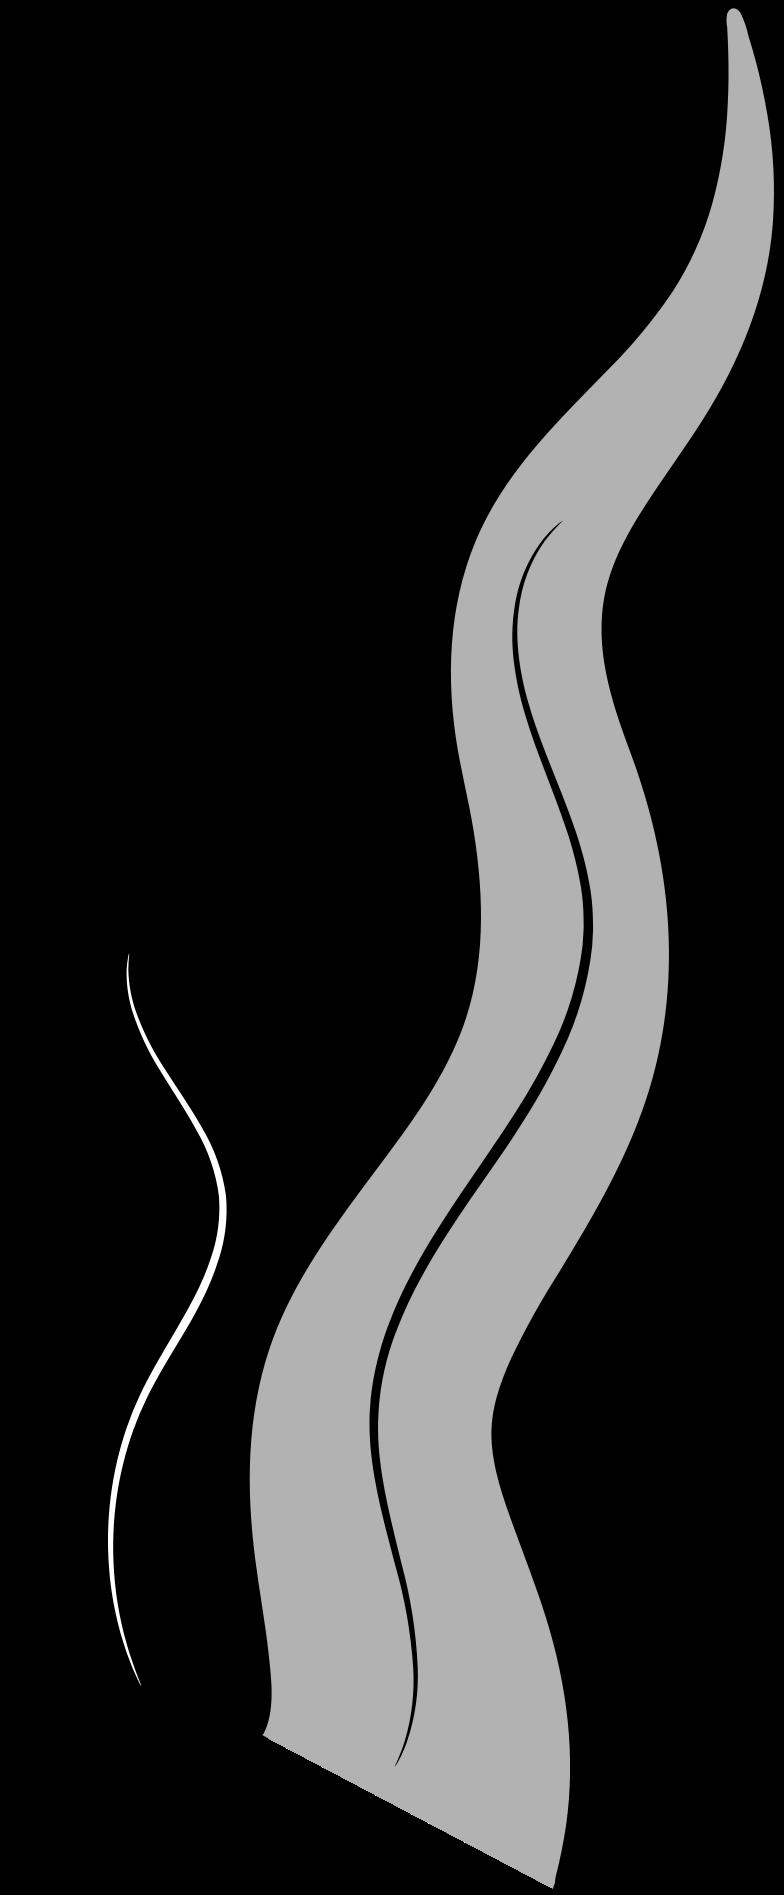 water plant Illustrazione clipart in PNG, SVG